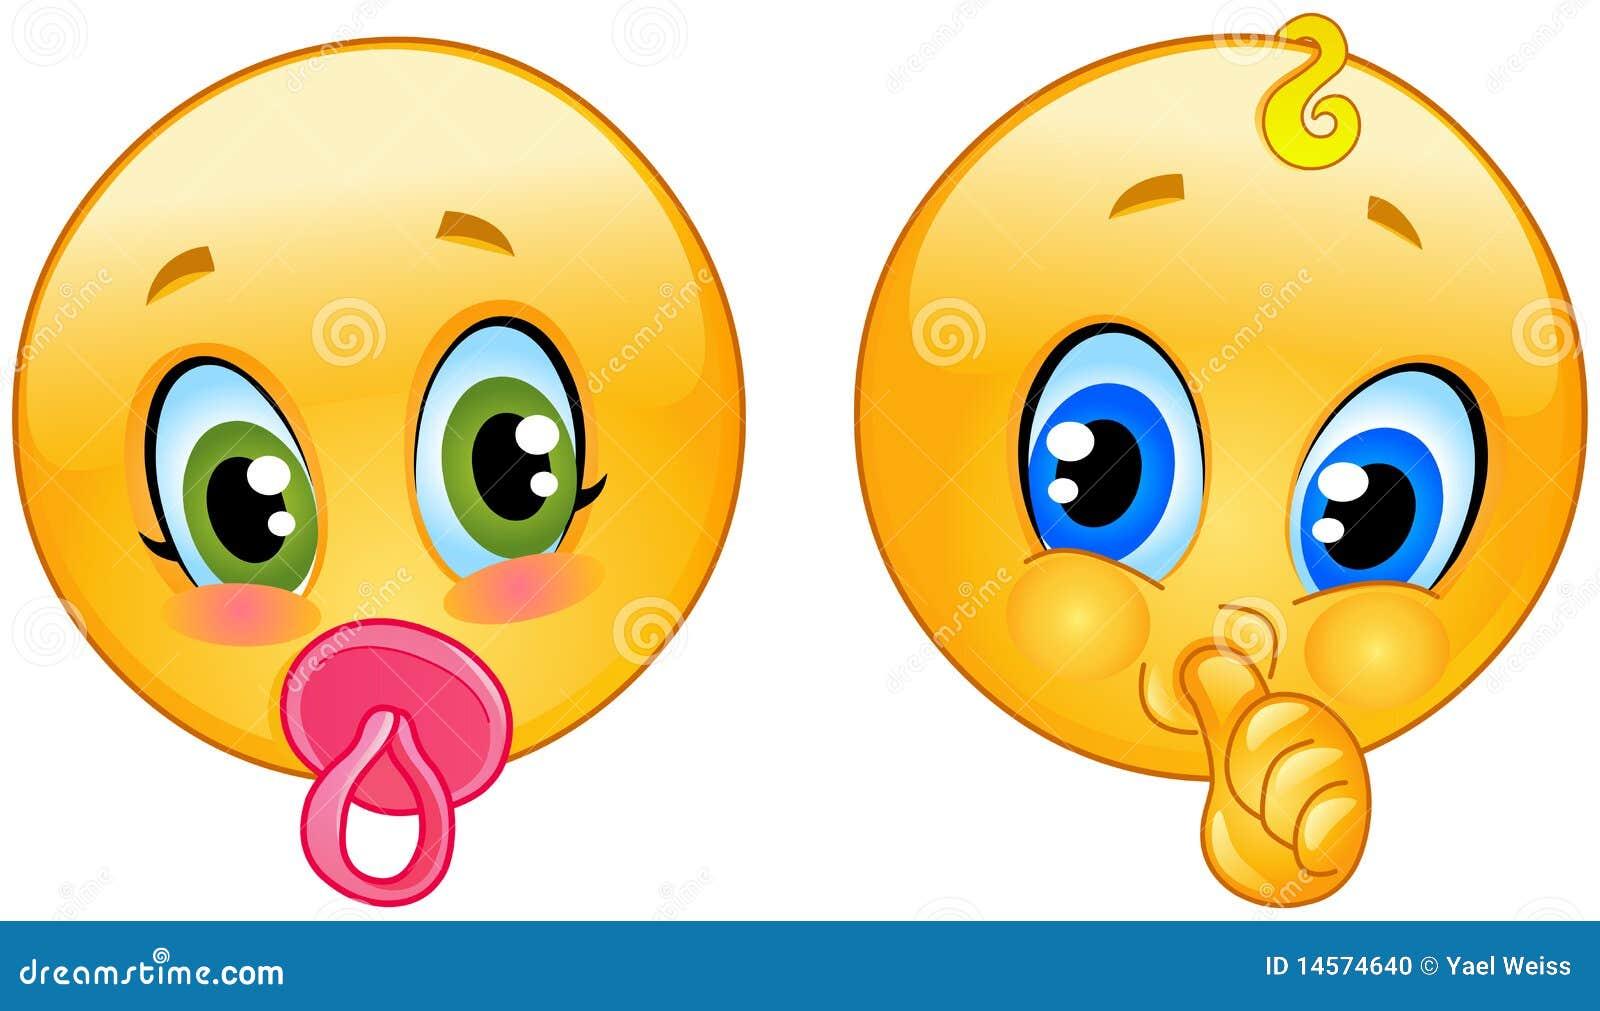 Baby Emoticons Stock Photo - Image: 14574640